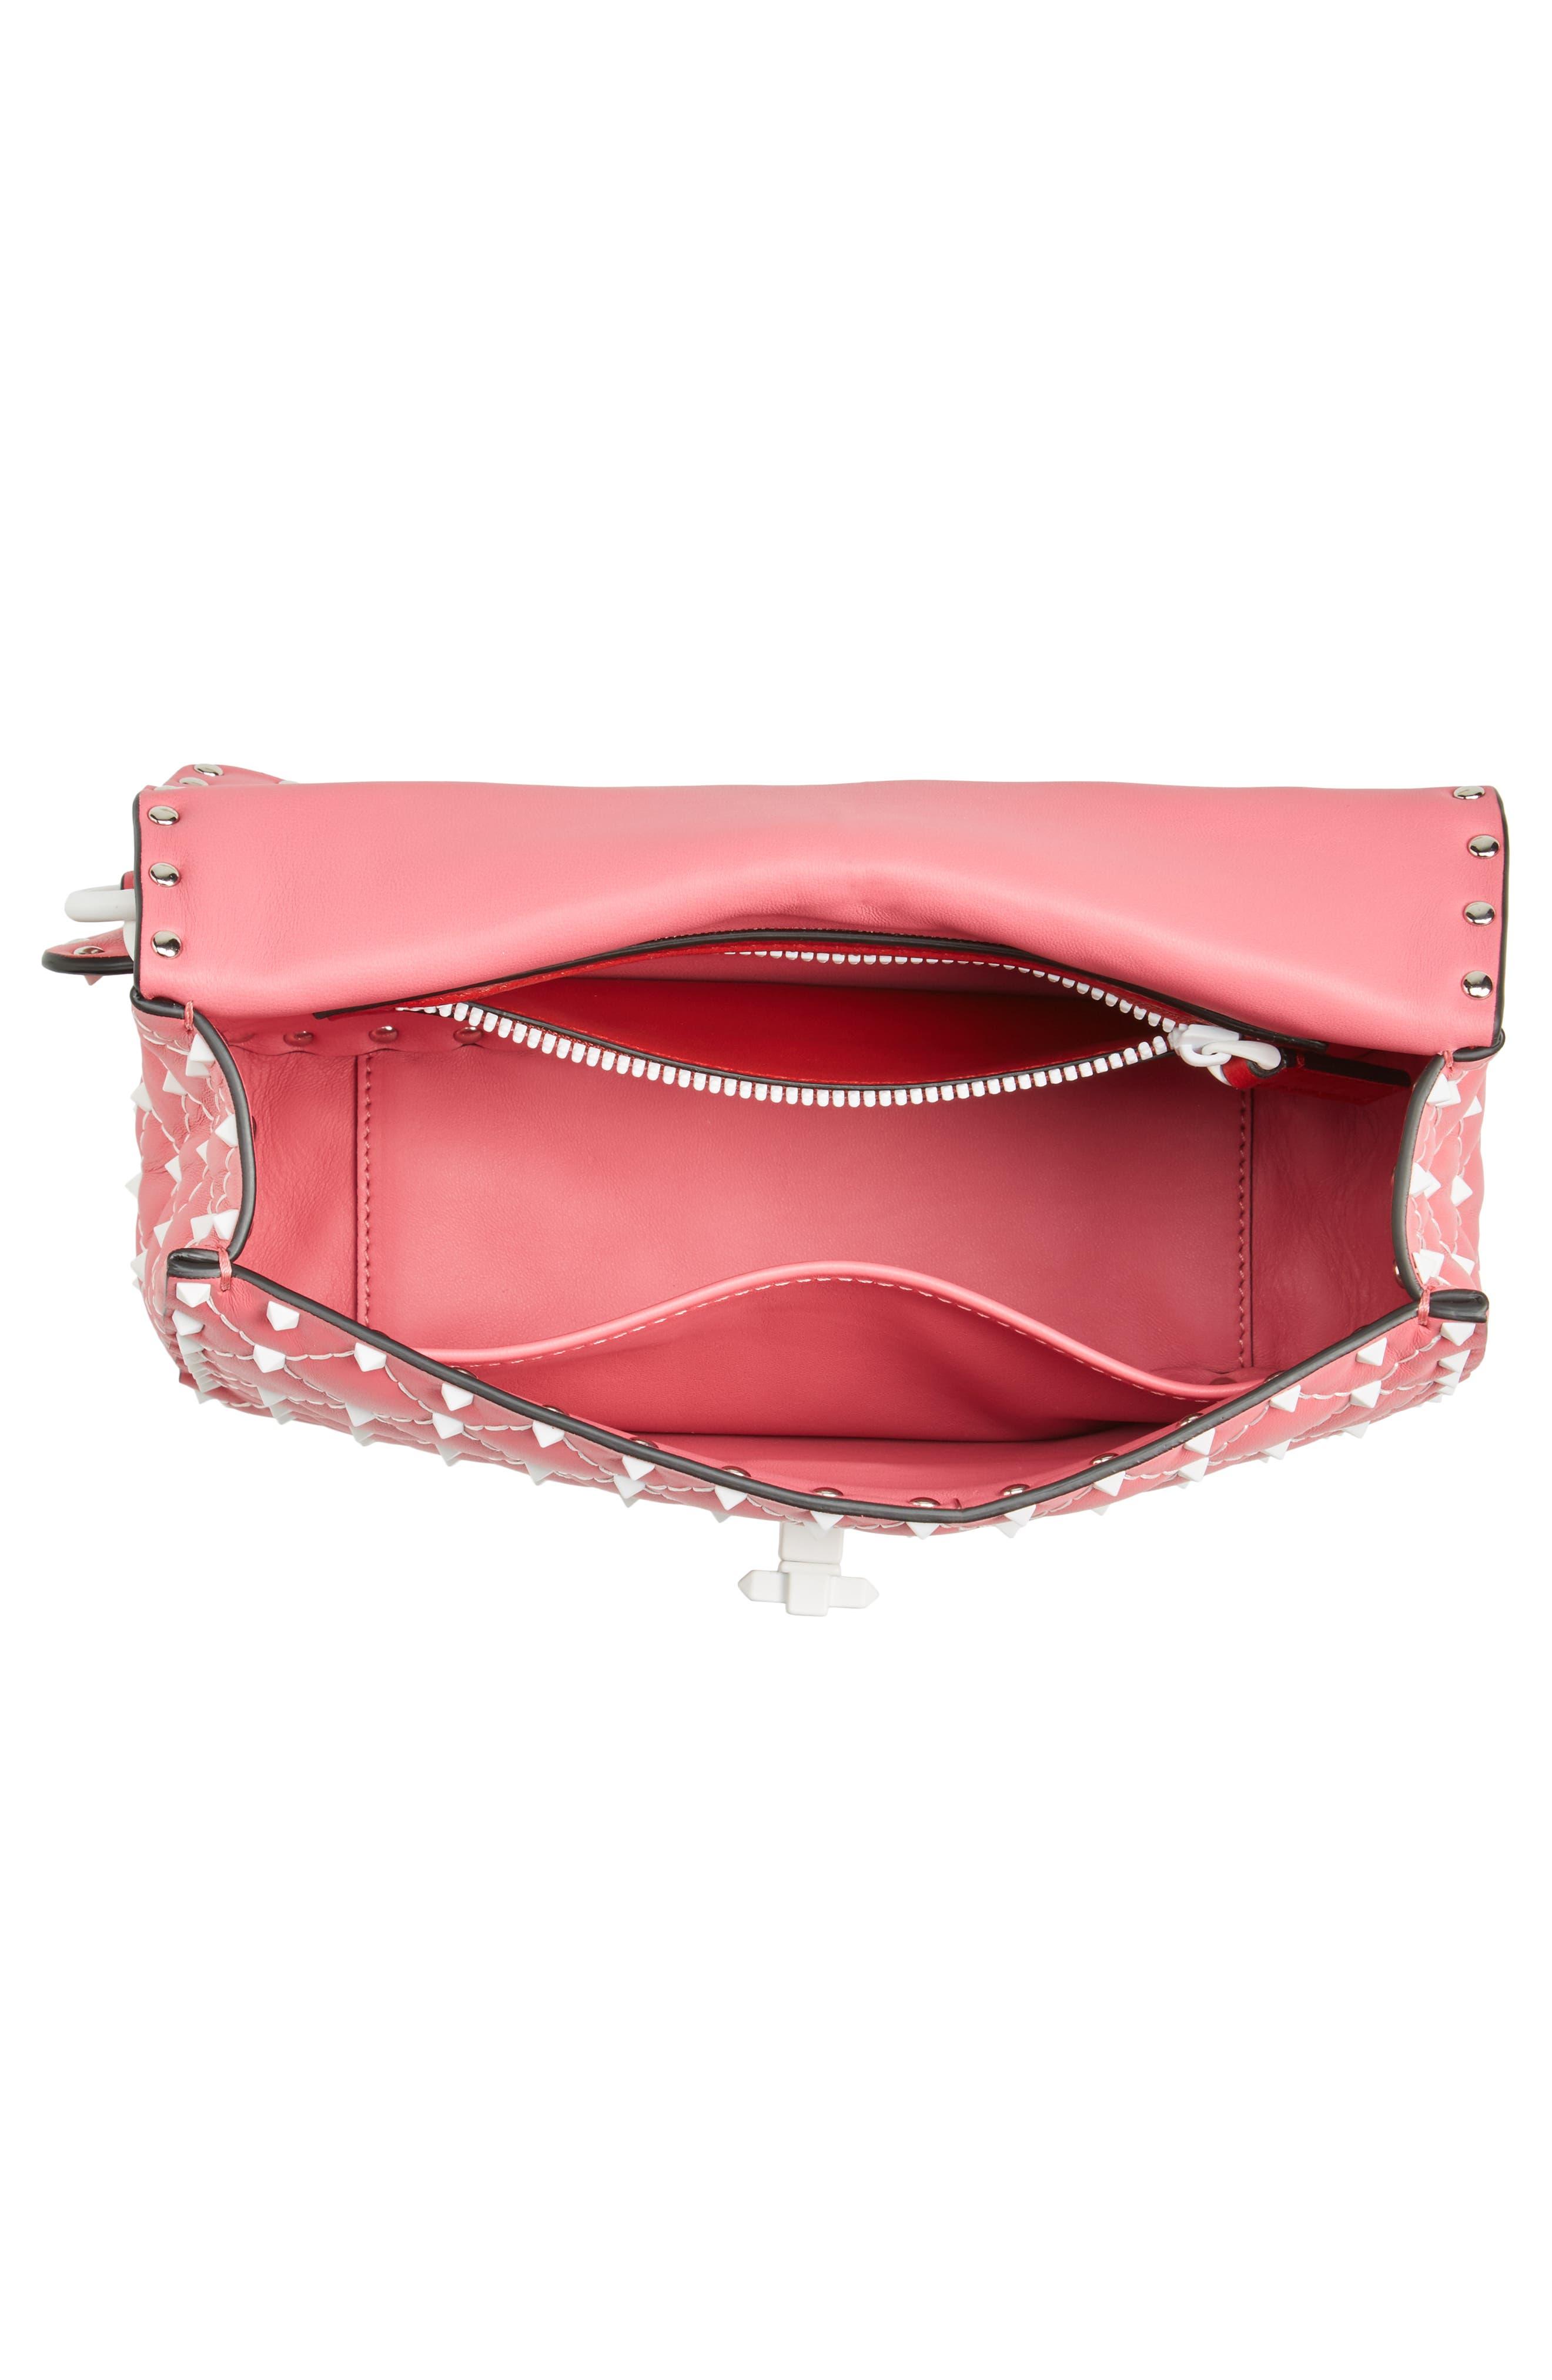 Medium Rockstud Matelassé Leather Shoulder Bag,                             Alternate thumbnail 12, color,